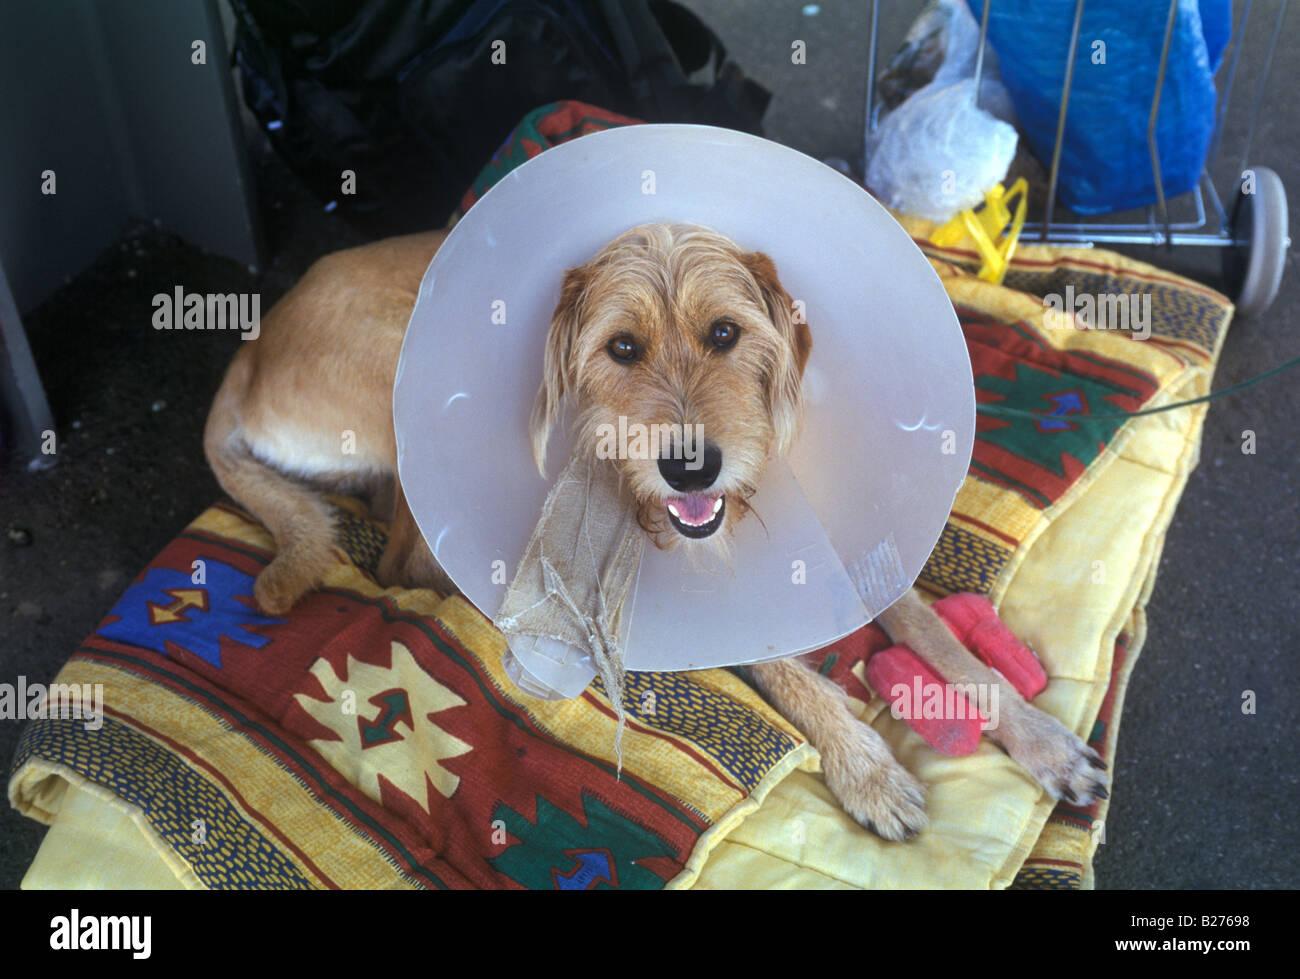 dog wearing elizabethan collar - Stock Image